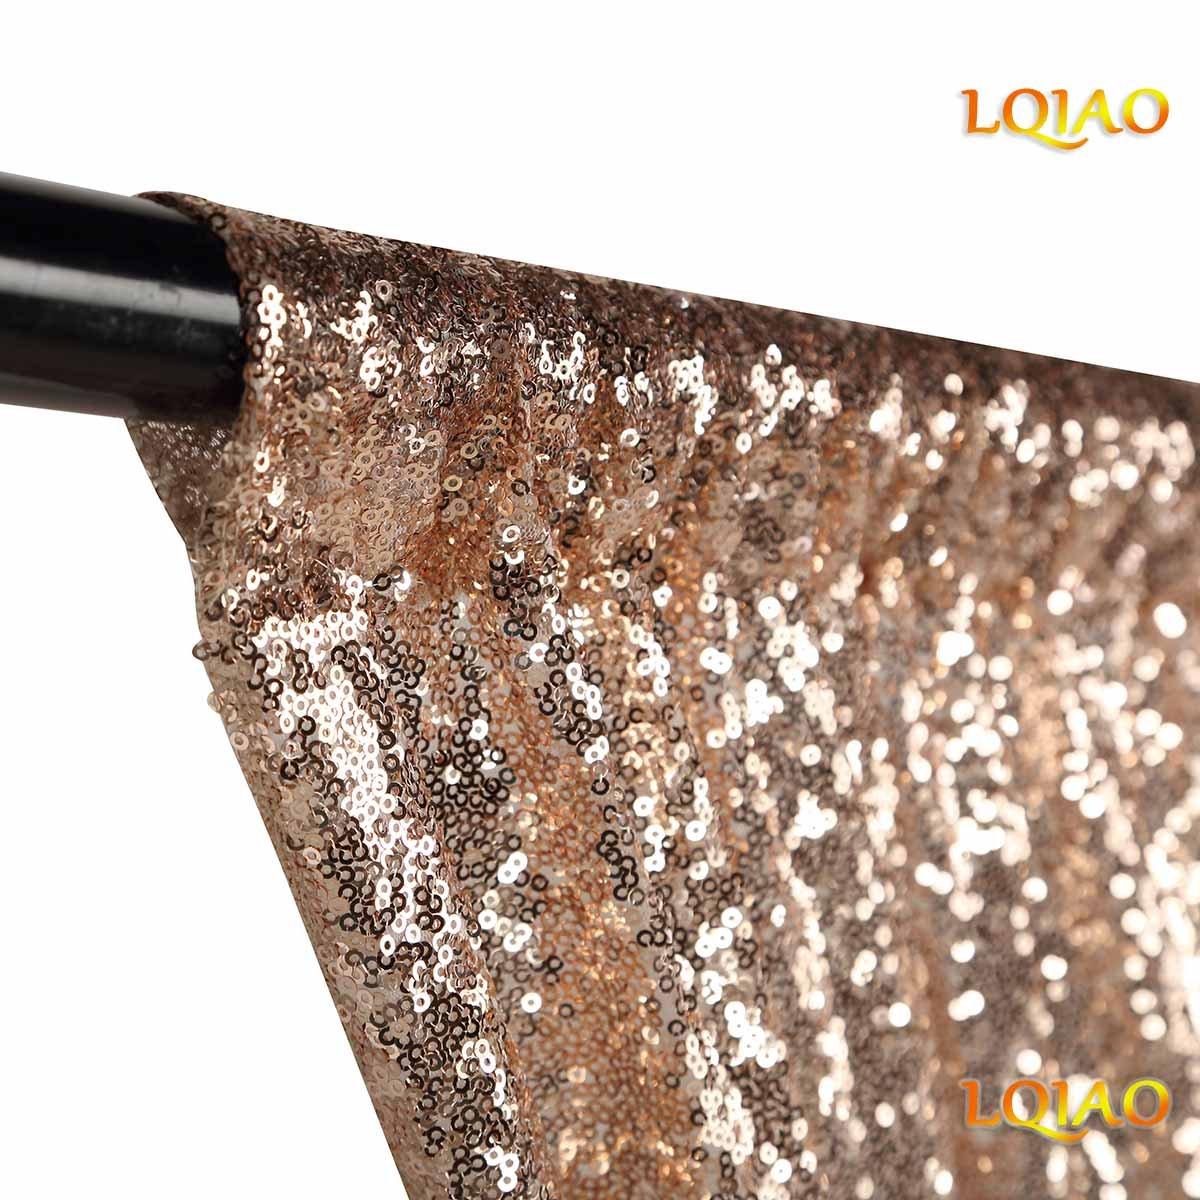 LQIAO 1ピース 2フィートx8フィート (60cmx245cm) シャンパンゴールドスパンコール生地 写真背景 クリスマス/結婚式/パーティー写真装飾用   B07GQTT13M